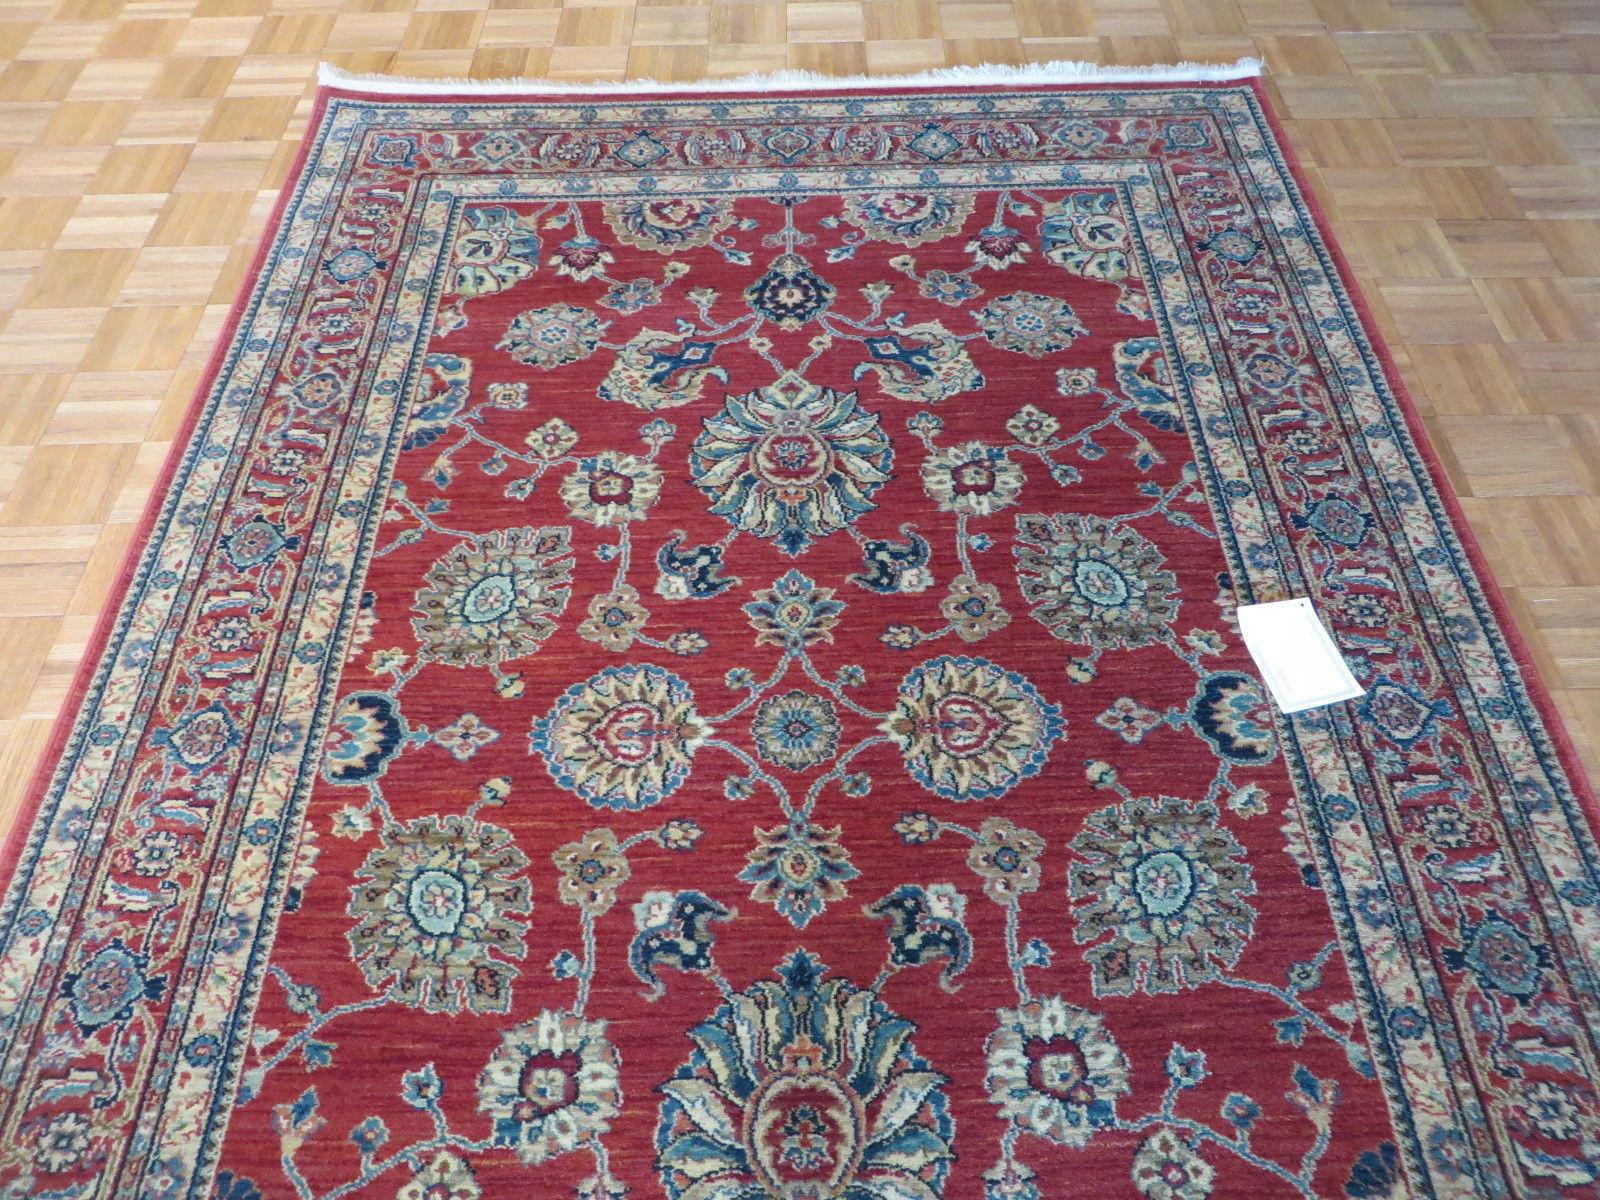 10 X 14 Brand New Karastan Rug Sovereign Sultana Red 14606